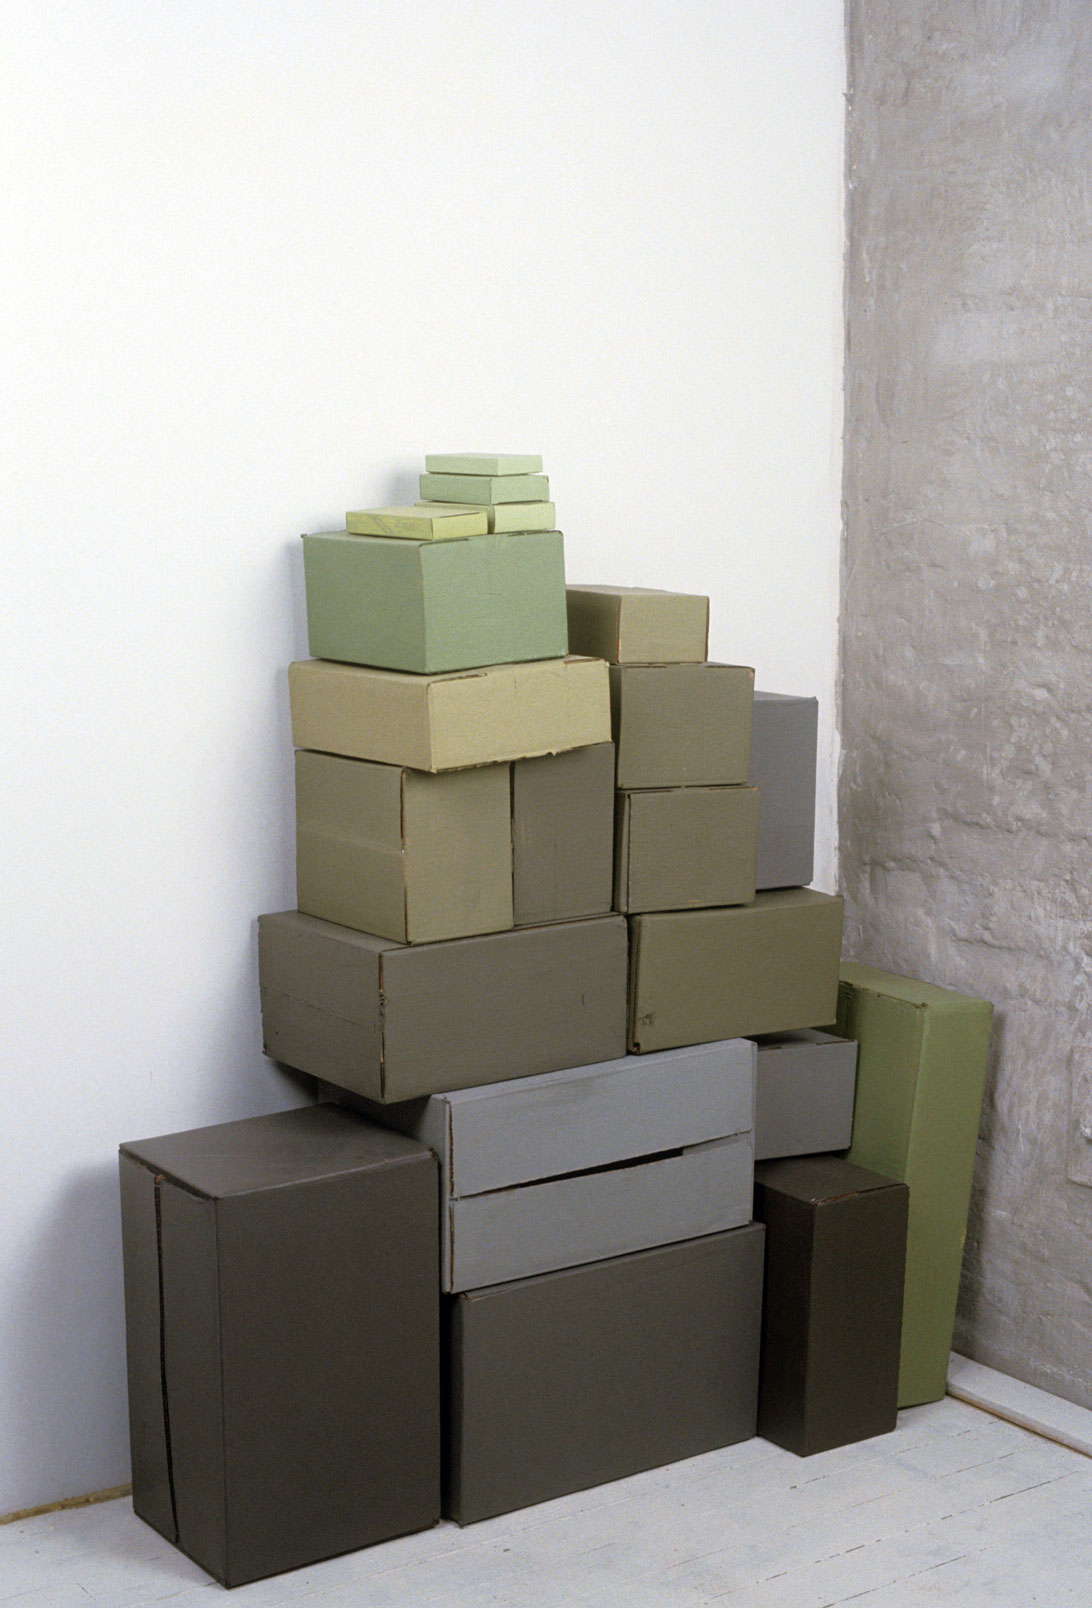 KS93S_Pennsylvania_latex-on-cardboard-boxes_44x40x16_web.jpg